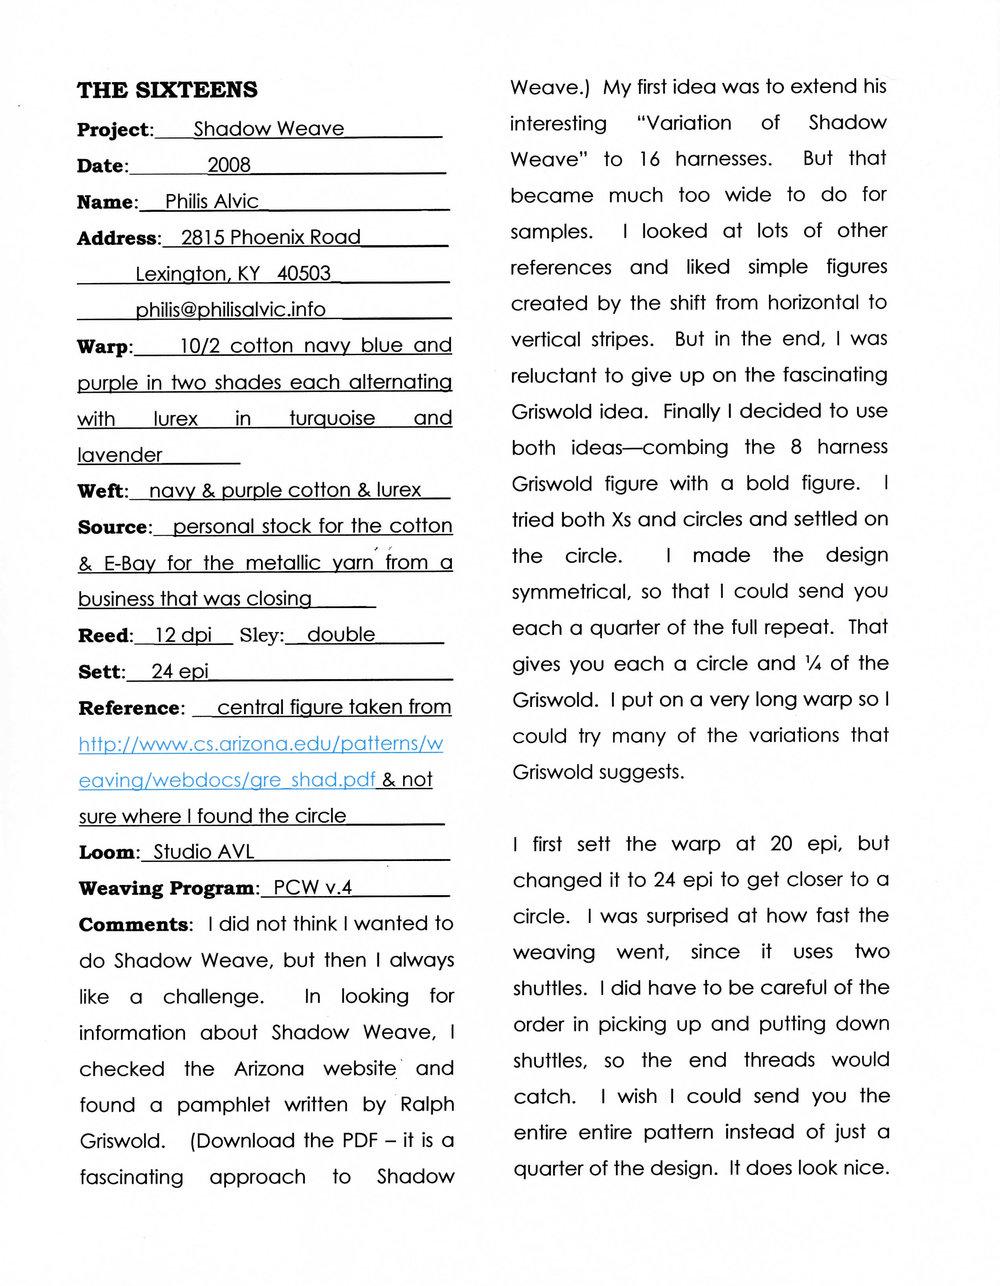 2008_Page_1_Image_0001.jpg